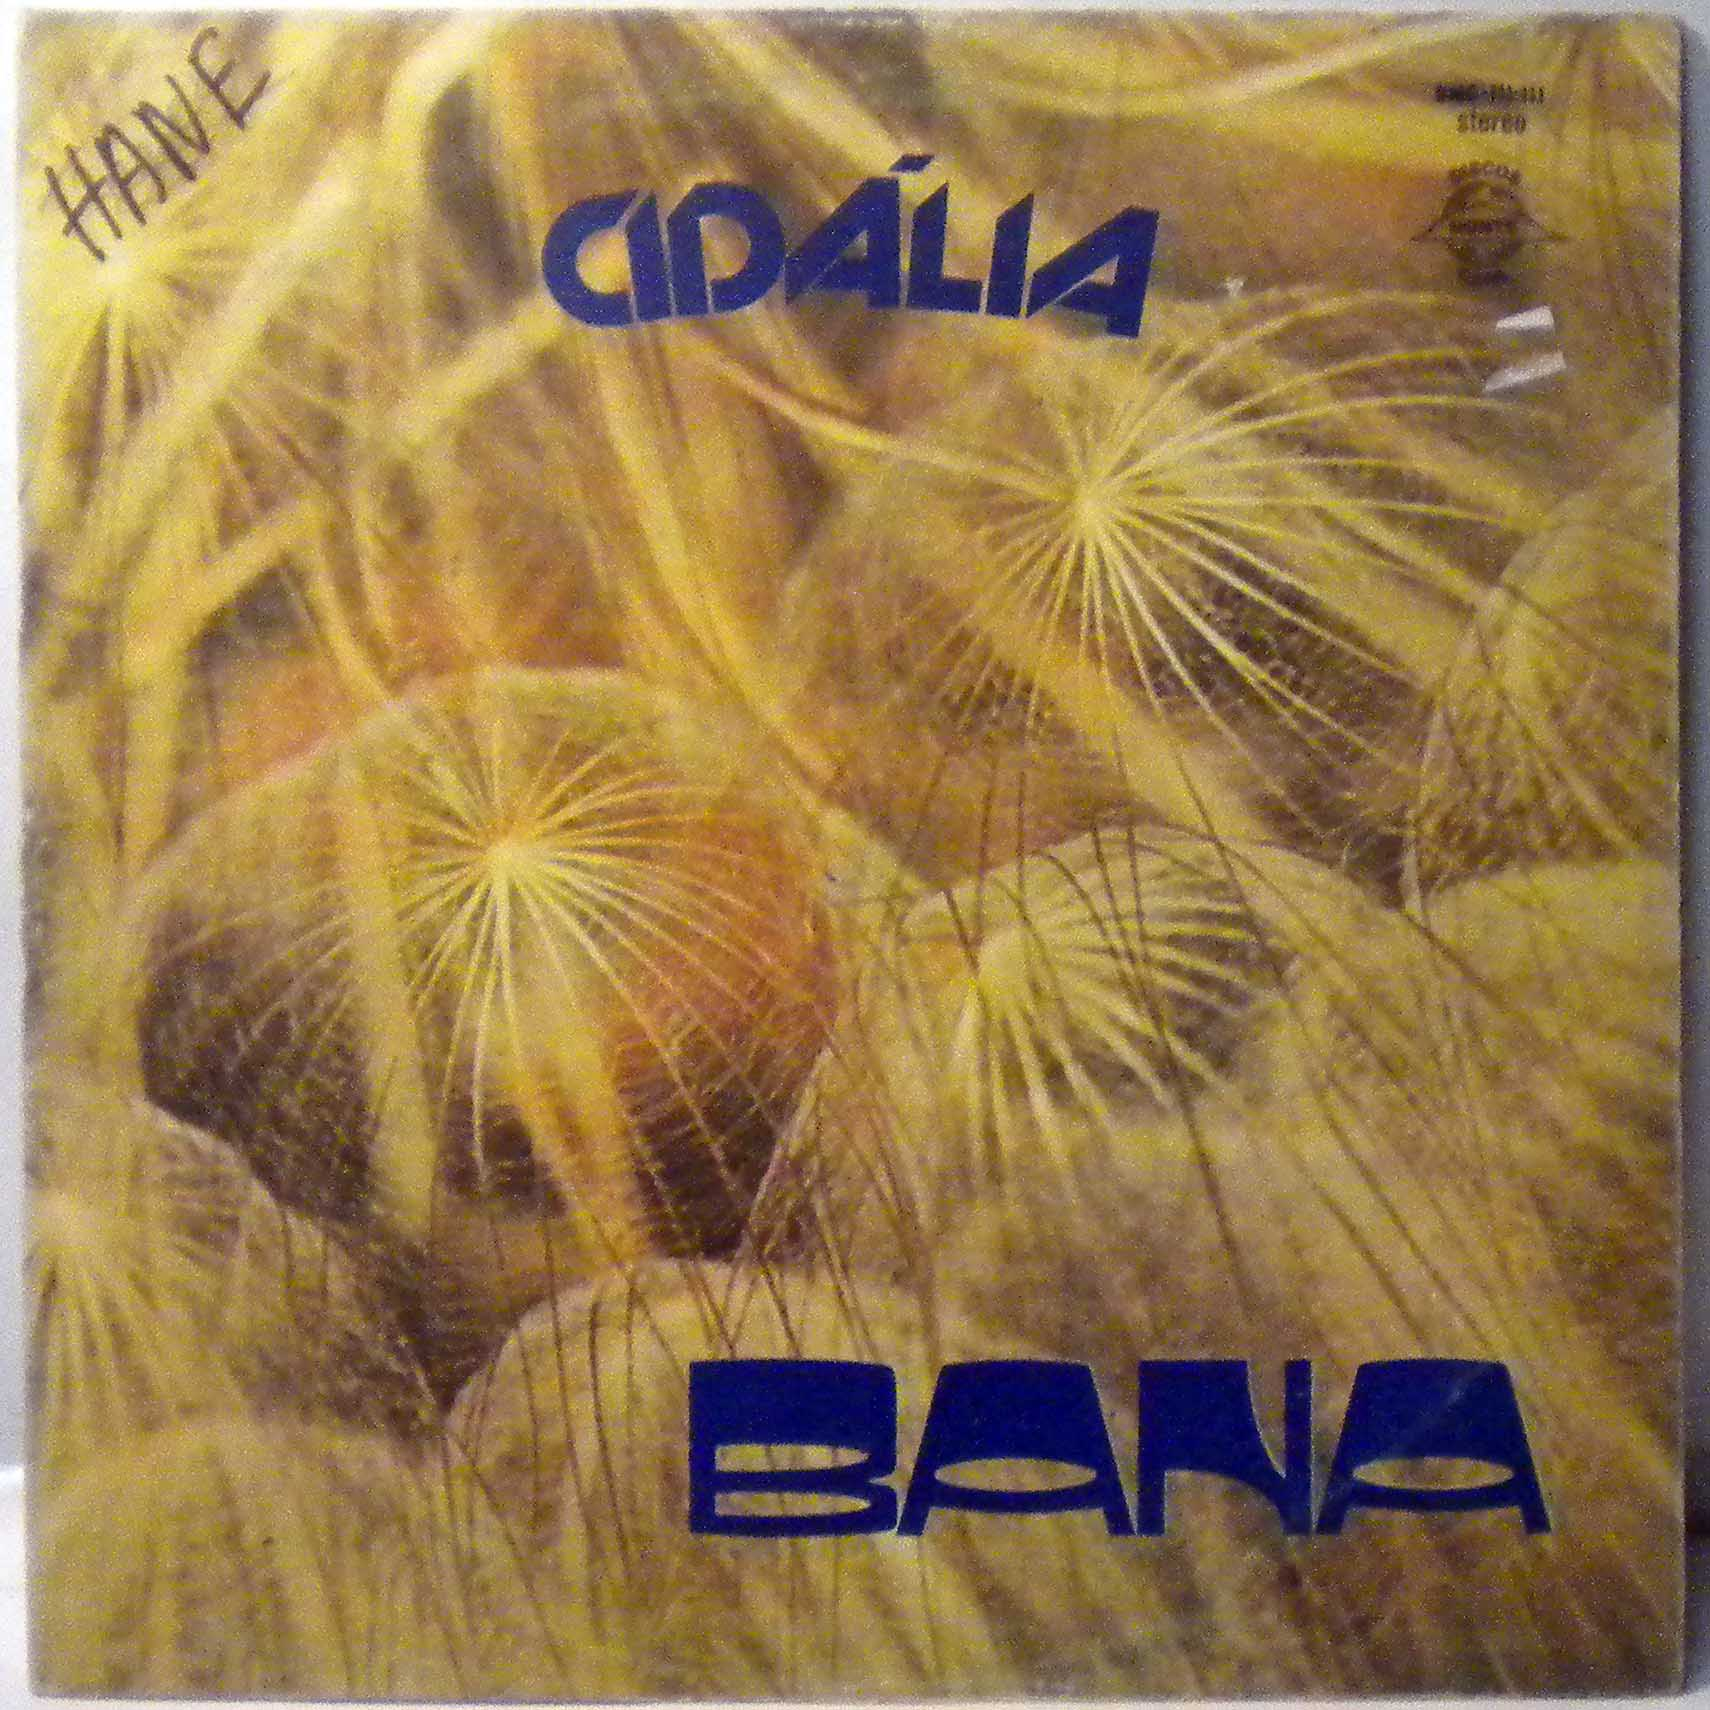 BANA - Cidalia - LP